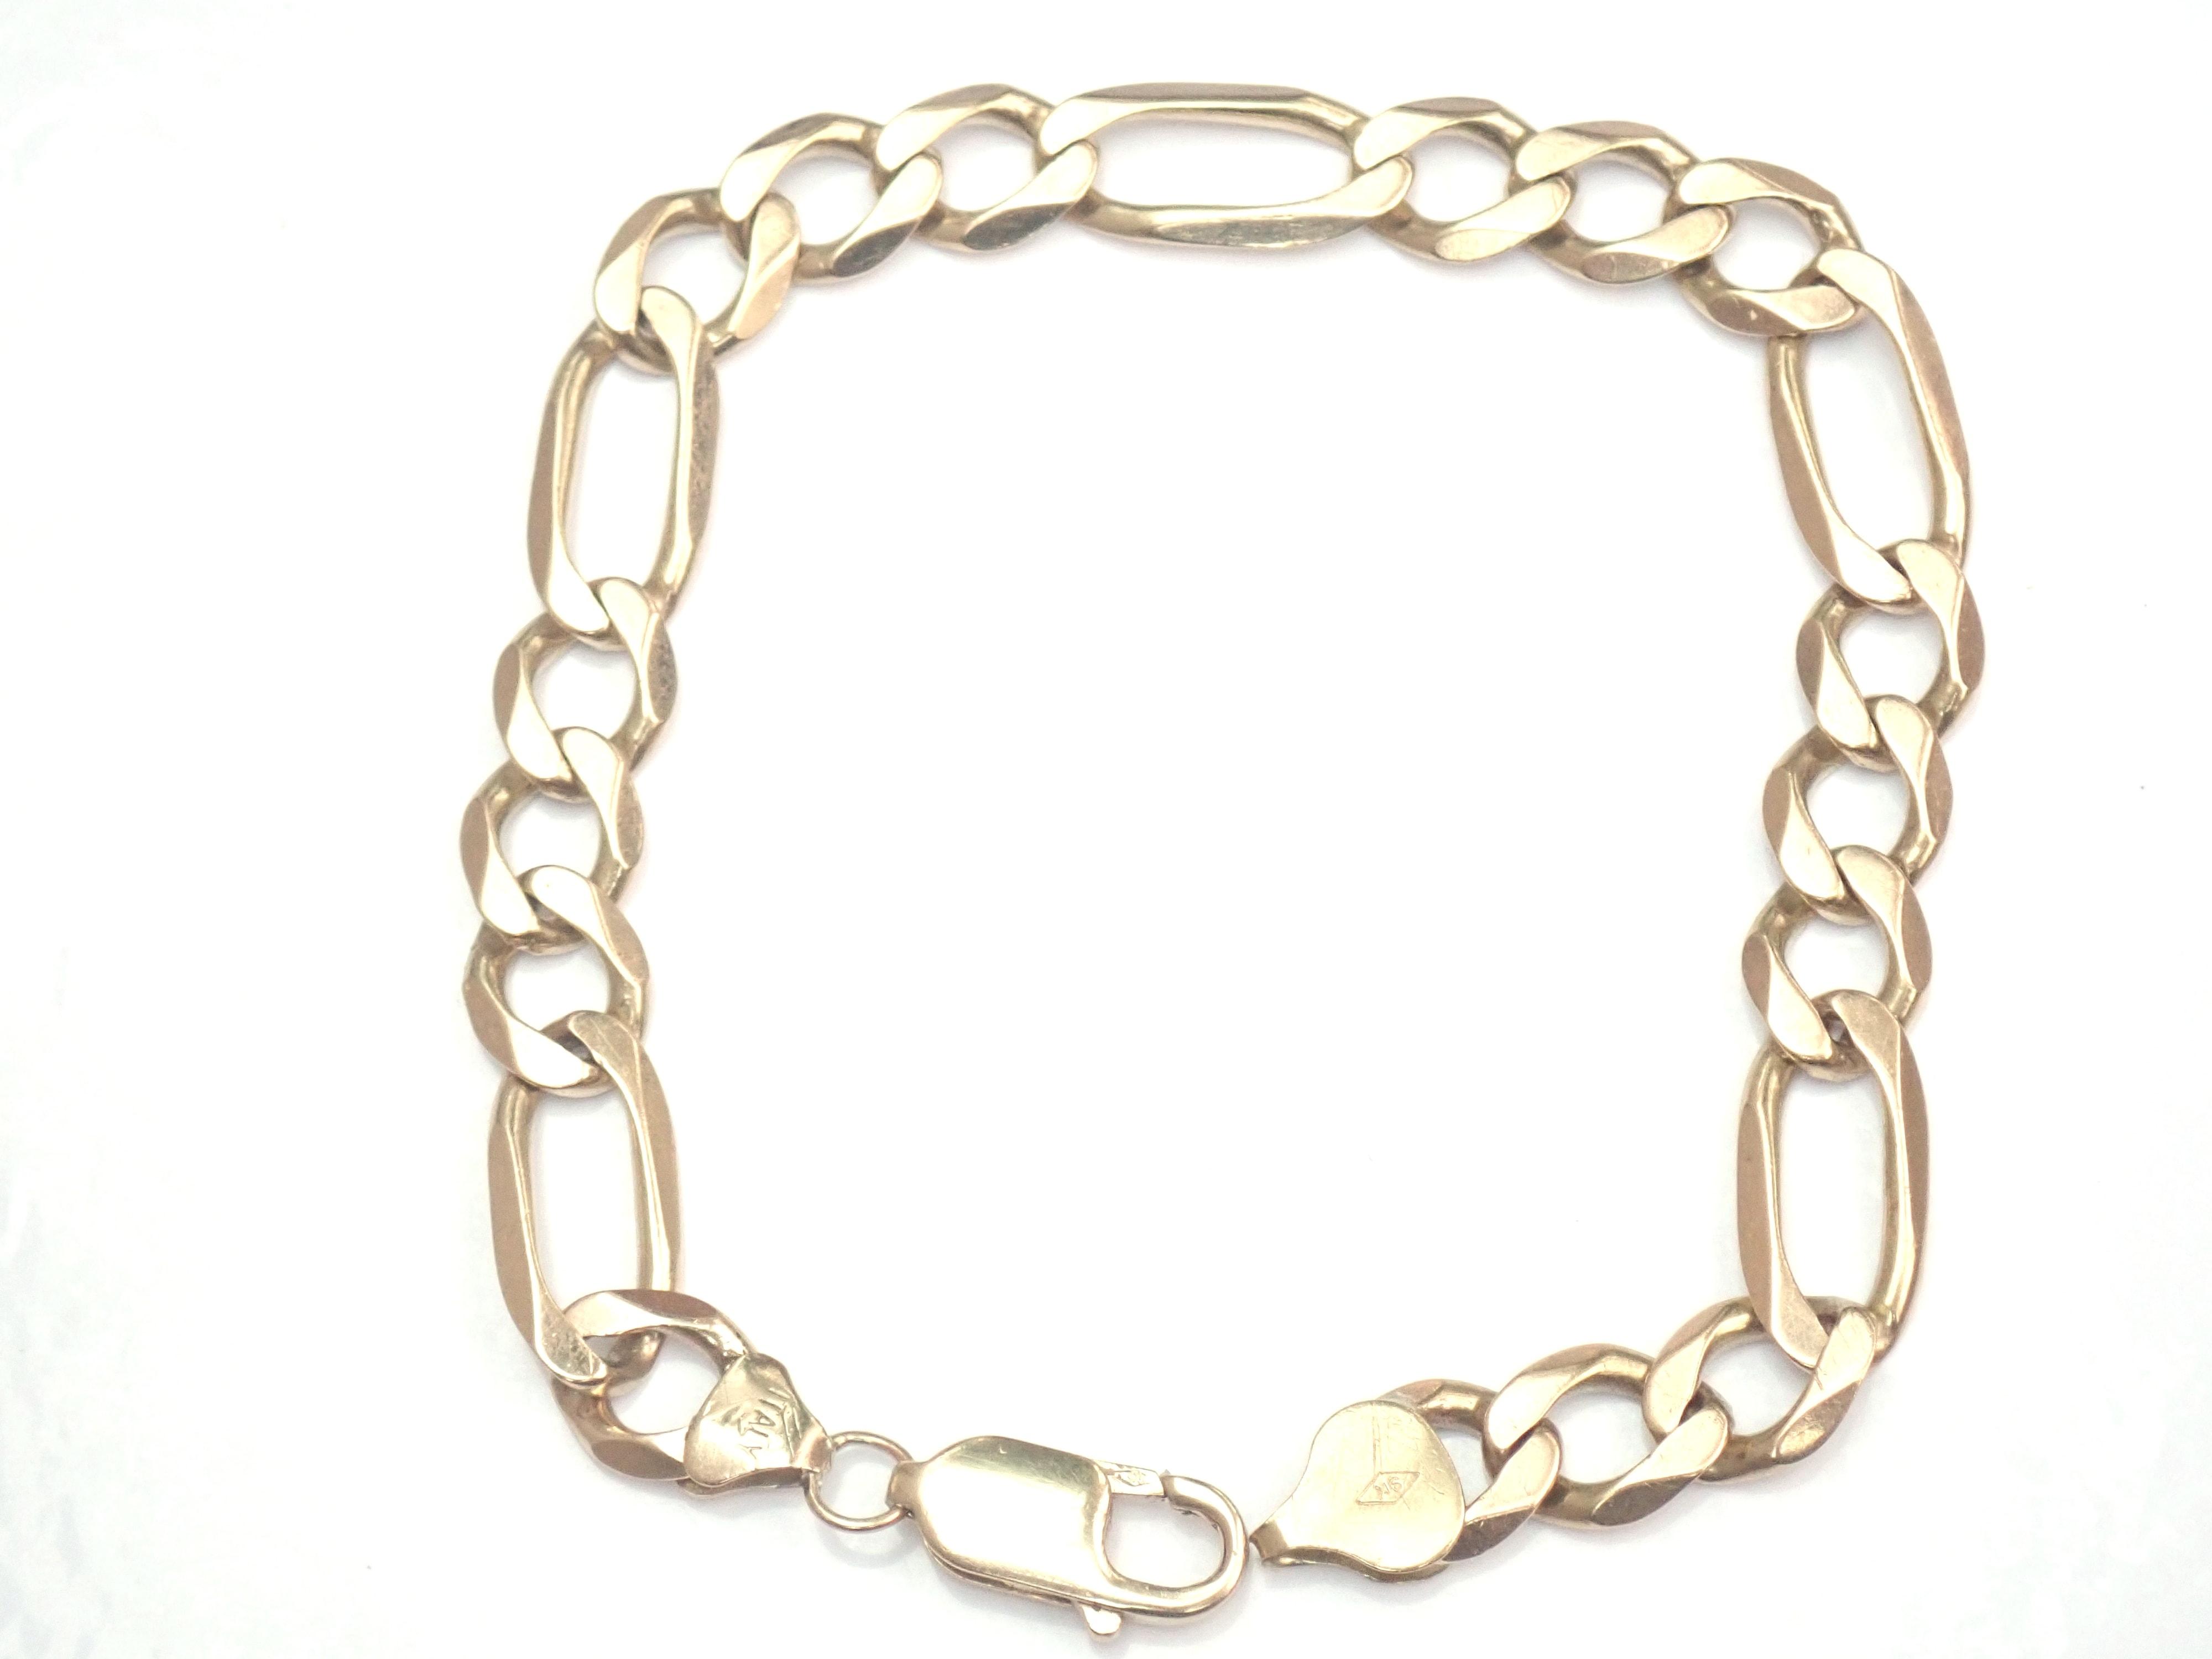 "AZZ00370 - 9k Gold Figaro link Bracelet 8.75"" - 15.52gms #310"